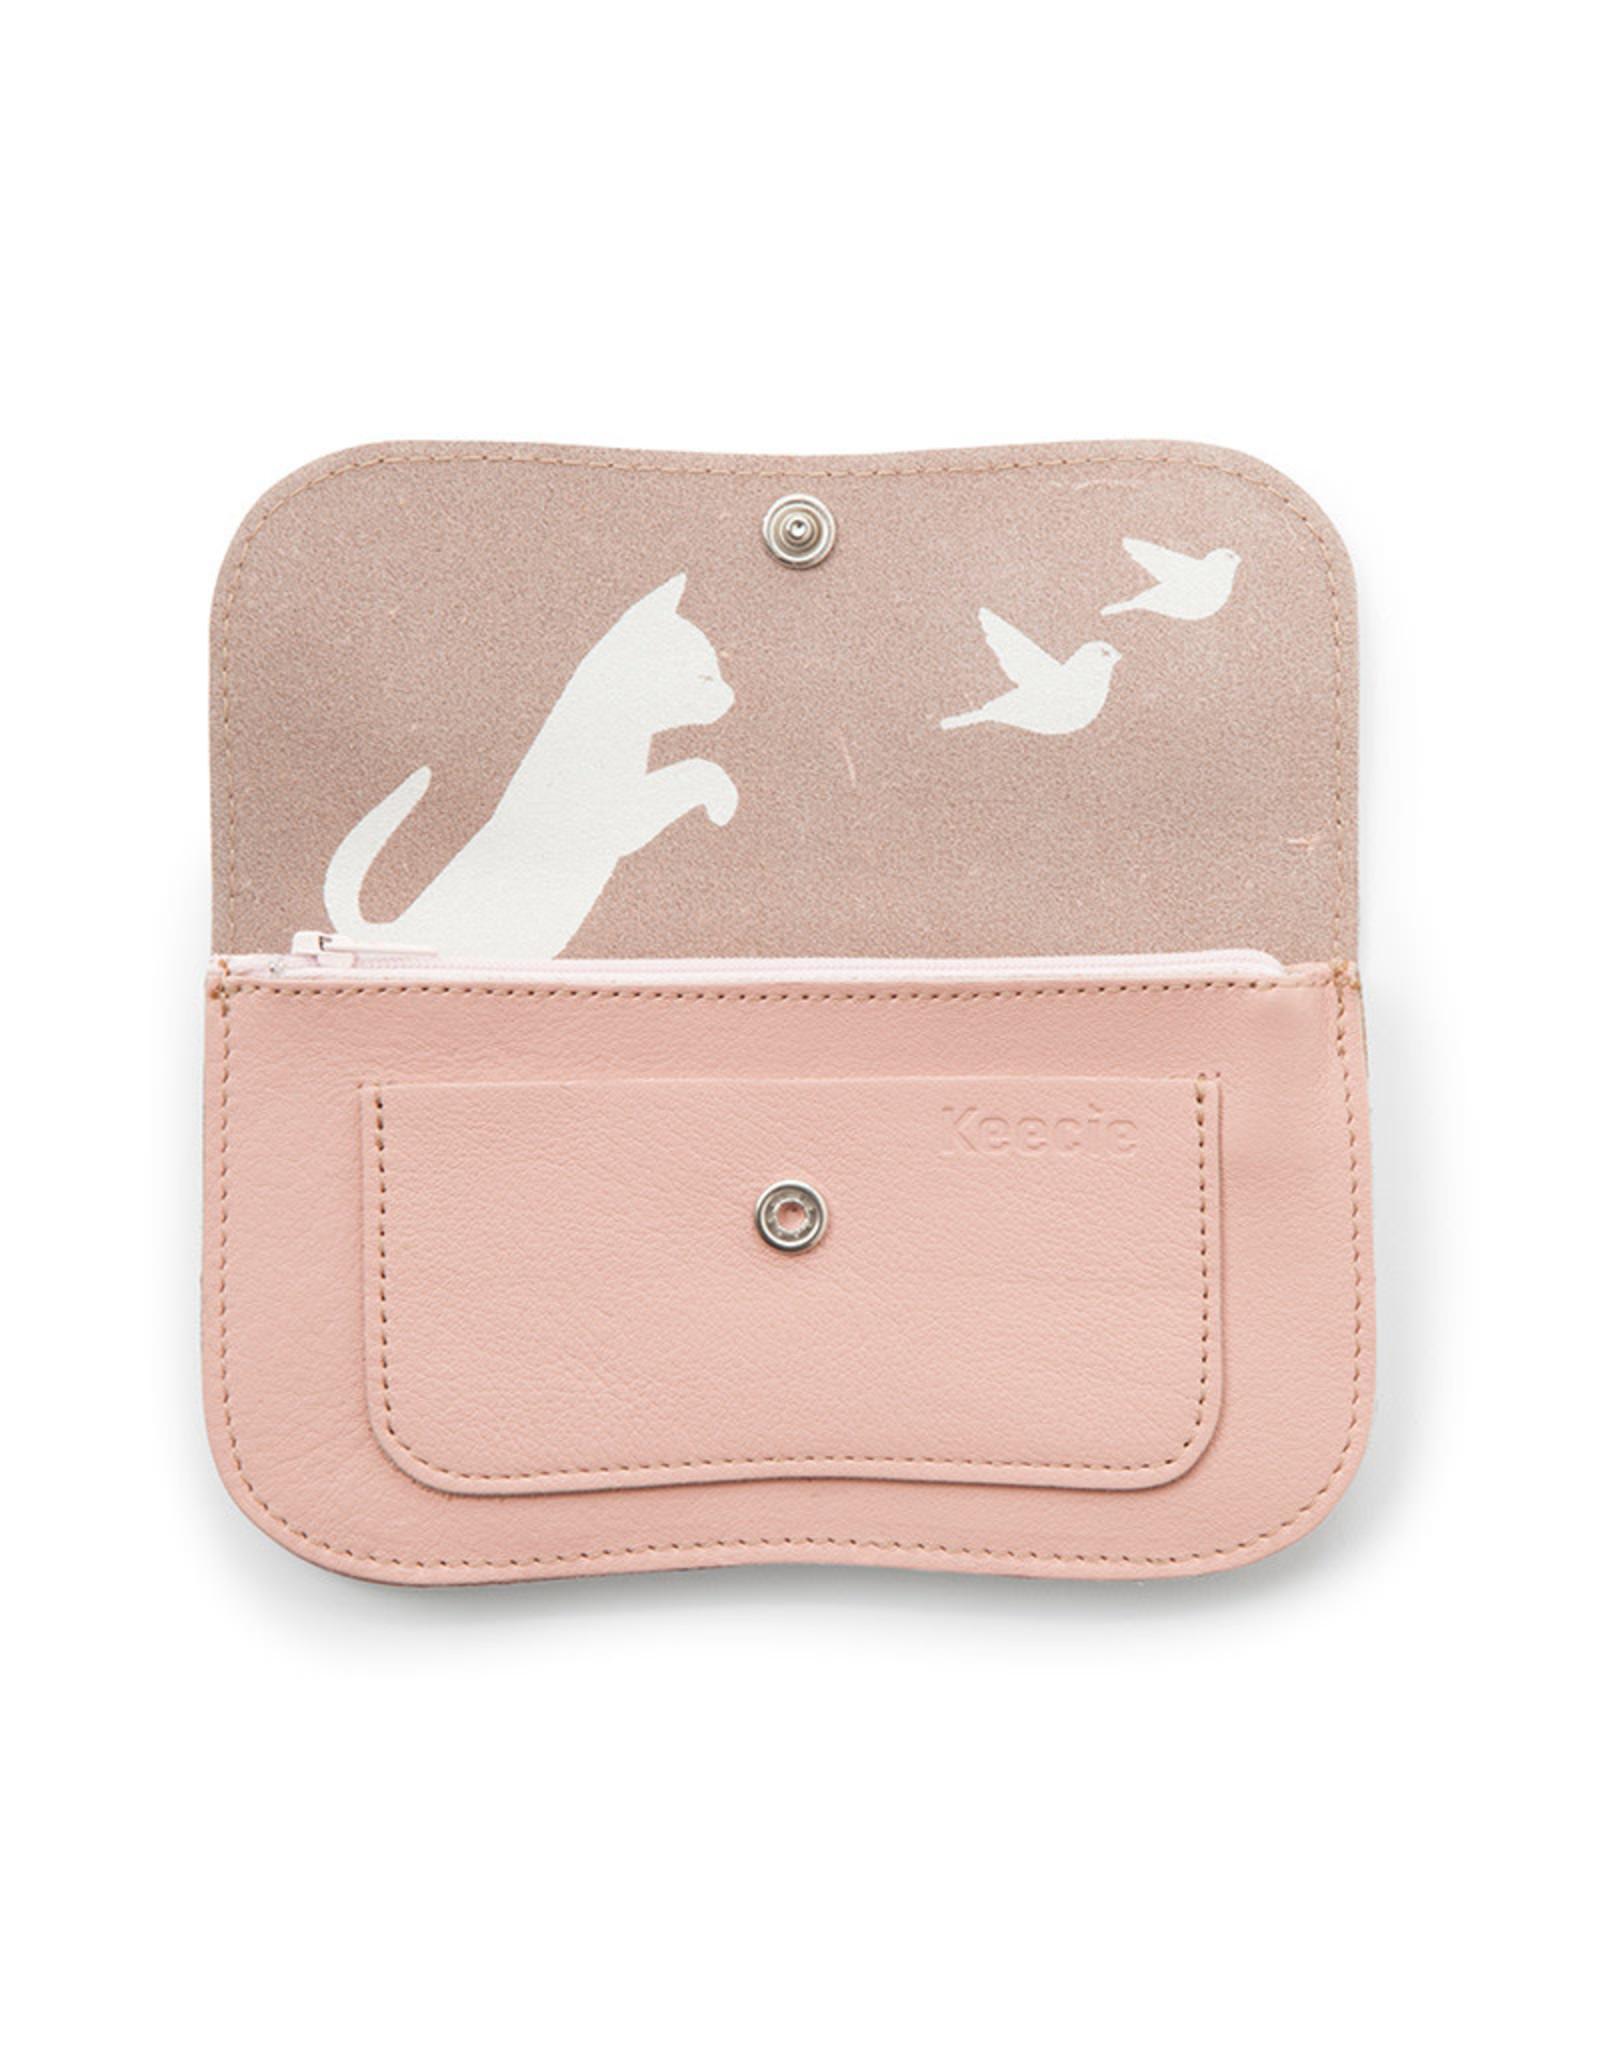 Keecie Cat chase medium wallet pink